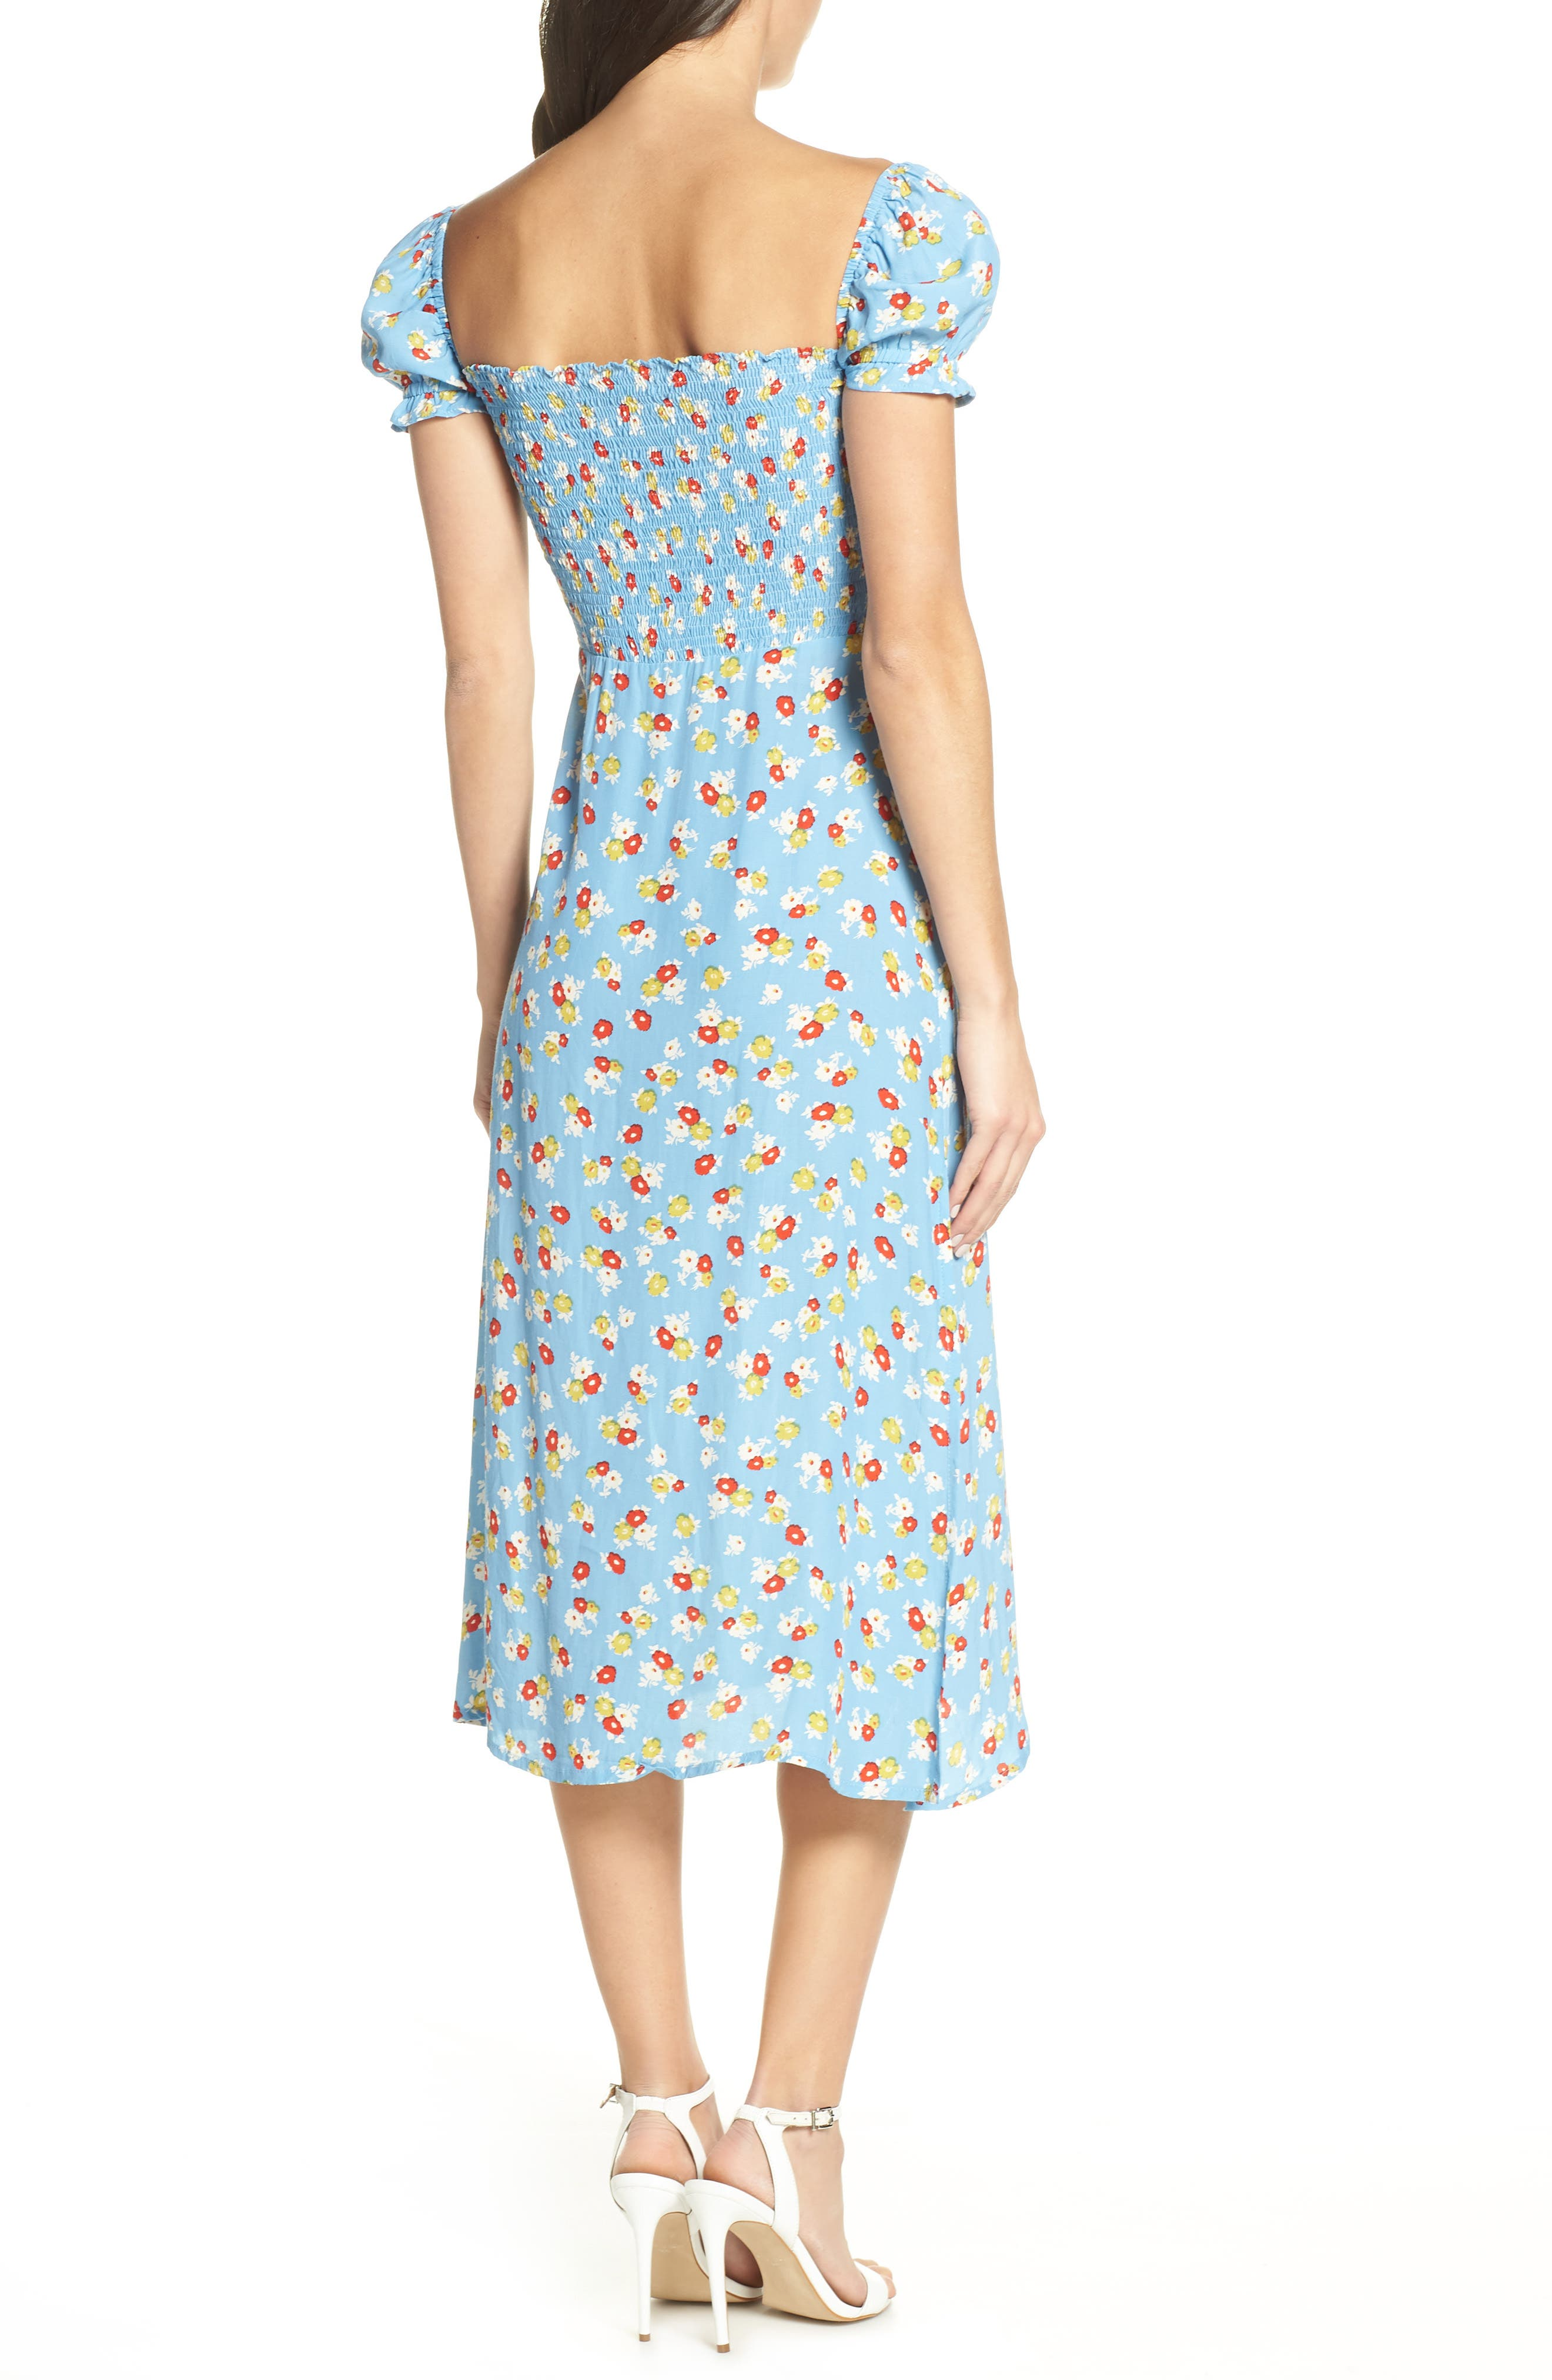 FAITHFULL THE BRAND, Castilo Jasmin Midi Dress, Alternate thumbnail 2, color, JASMIN FLORAL PRINT - BLUE